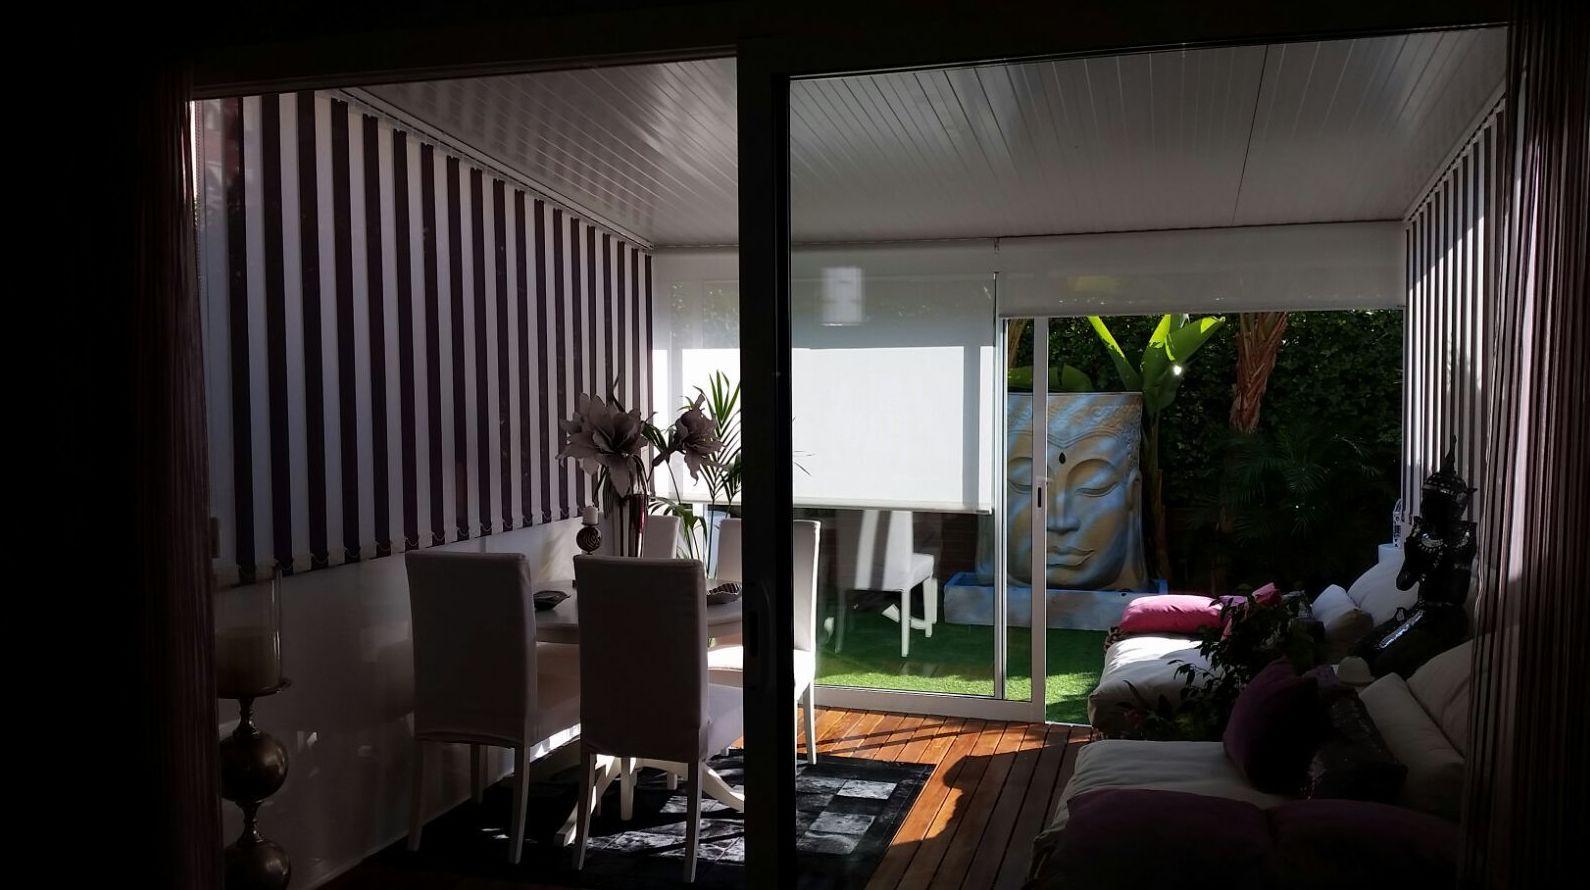 Foto 26 de Cortinas y decoración textil en Premià de Mar | Premià Decoració